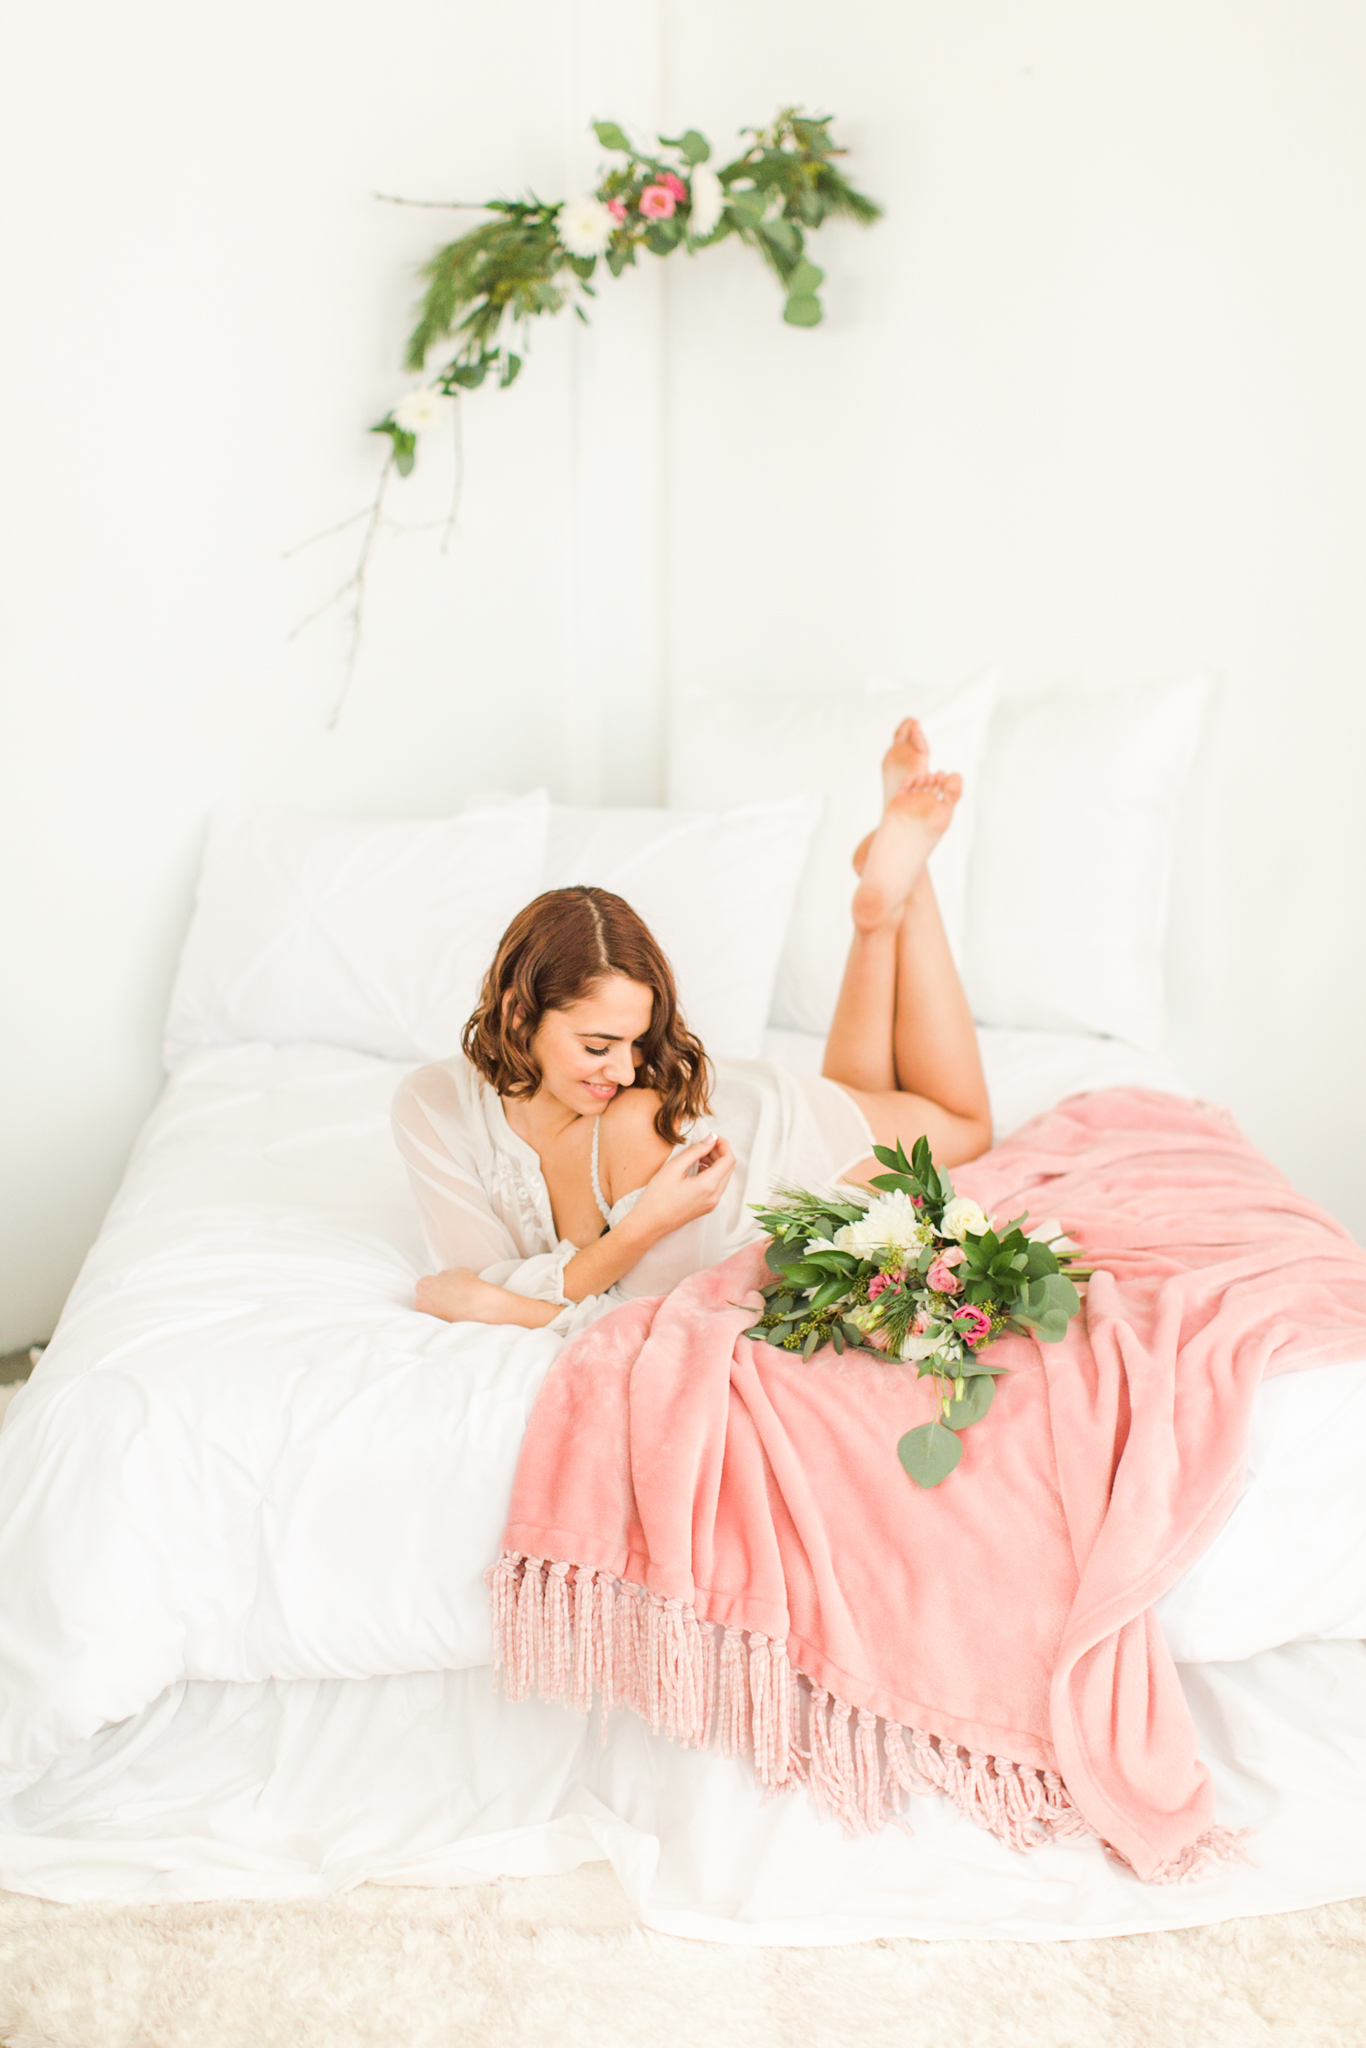 Bridal Boudoir - Shaina Lee Photography WEB-231.jpg